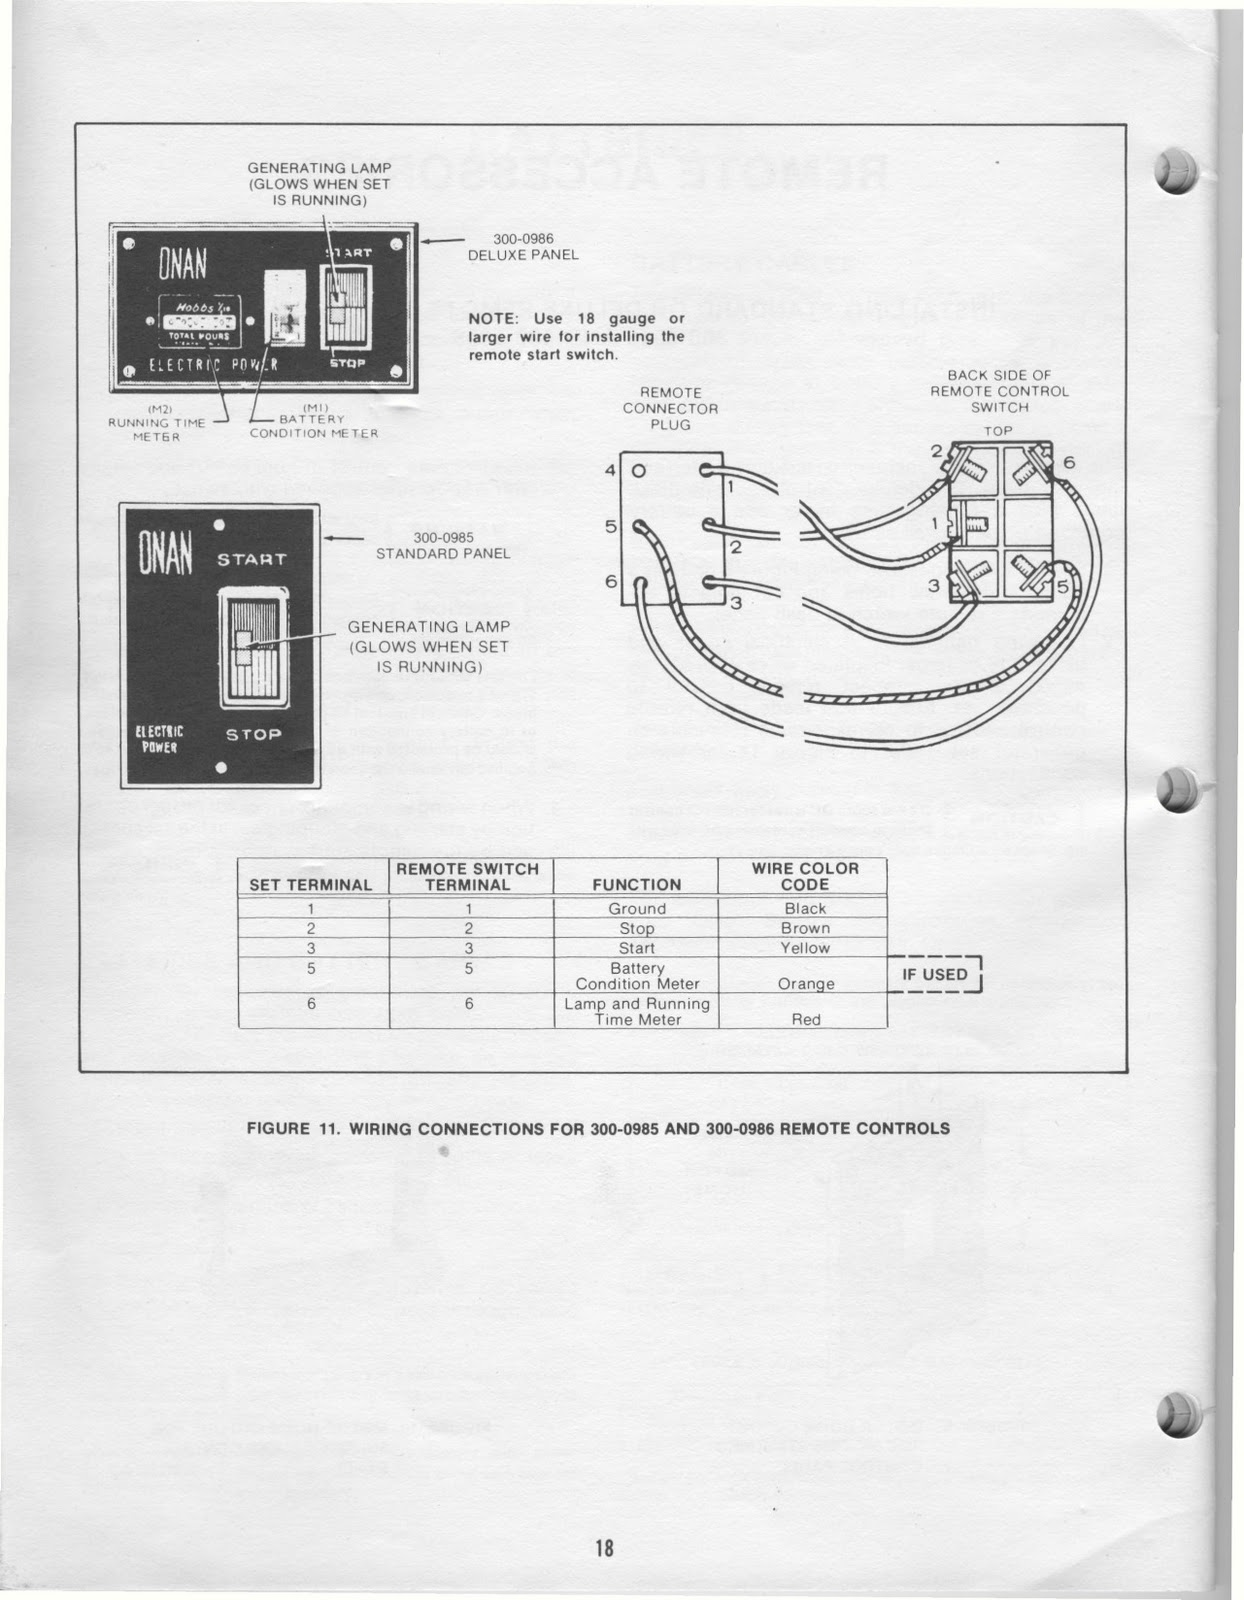 10 Kw Onan Wiring Diagrams Detailed Schematics Diagram 4 Wire Generator 0 Bfa 4000 Parts